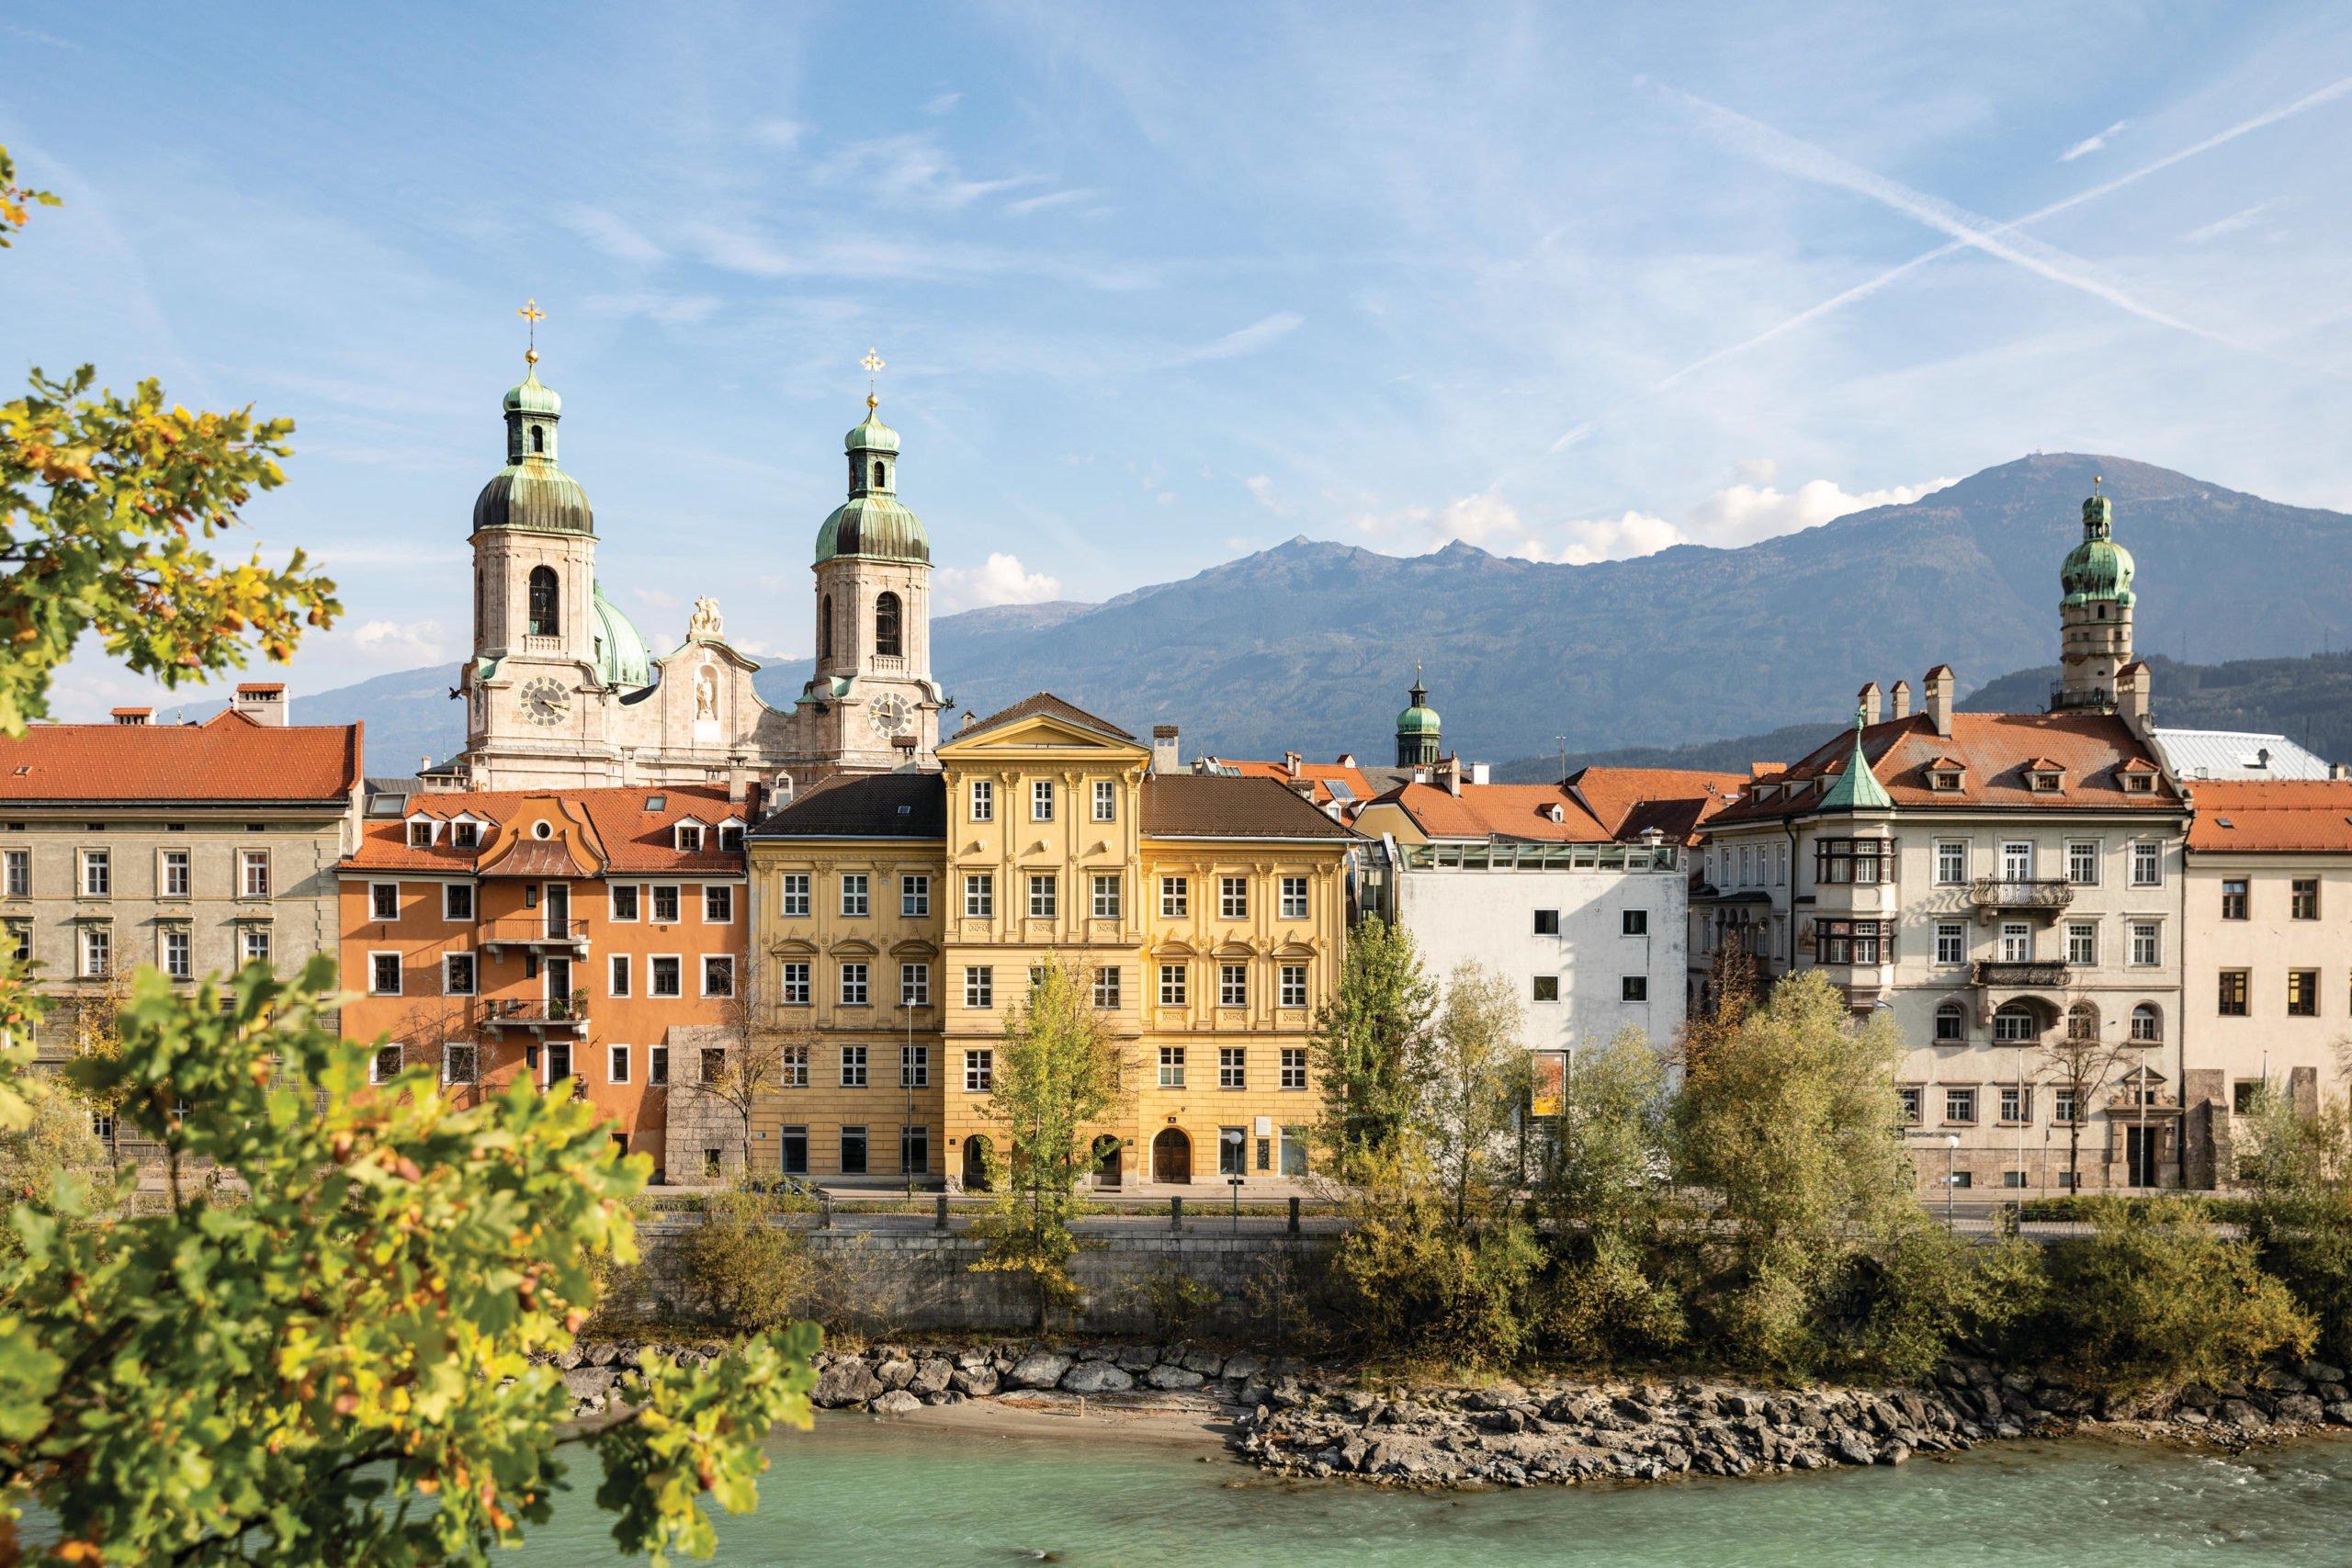 Altstadt Things To Do in Innsbruck